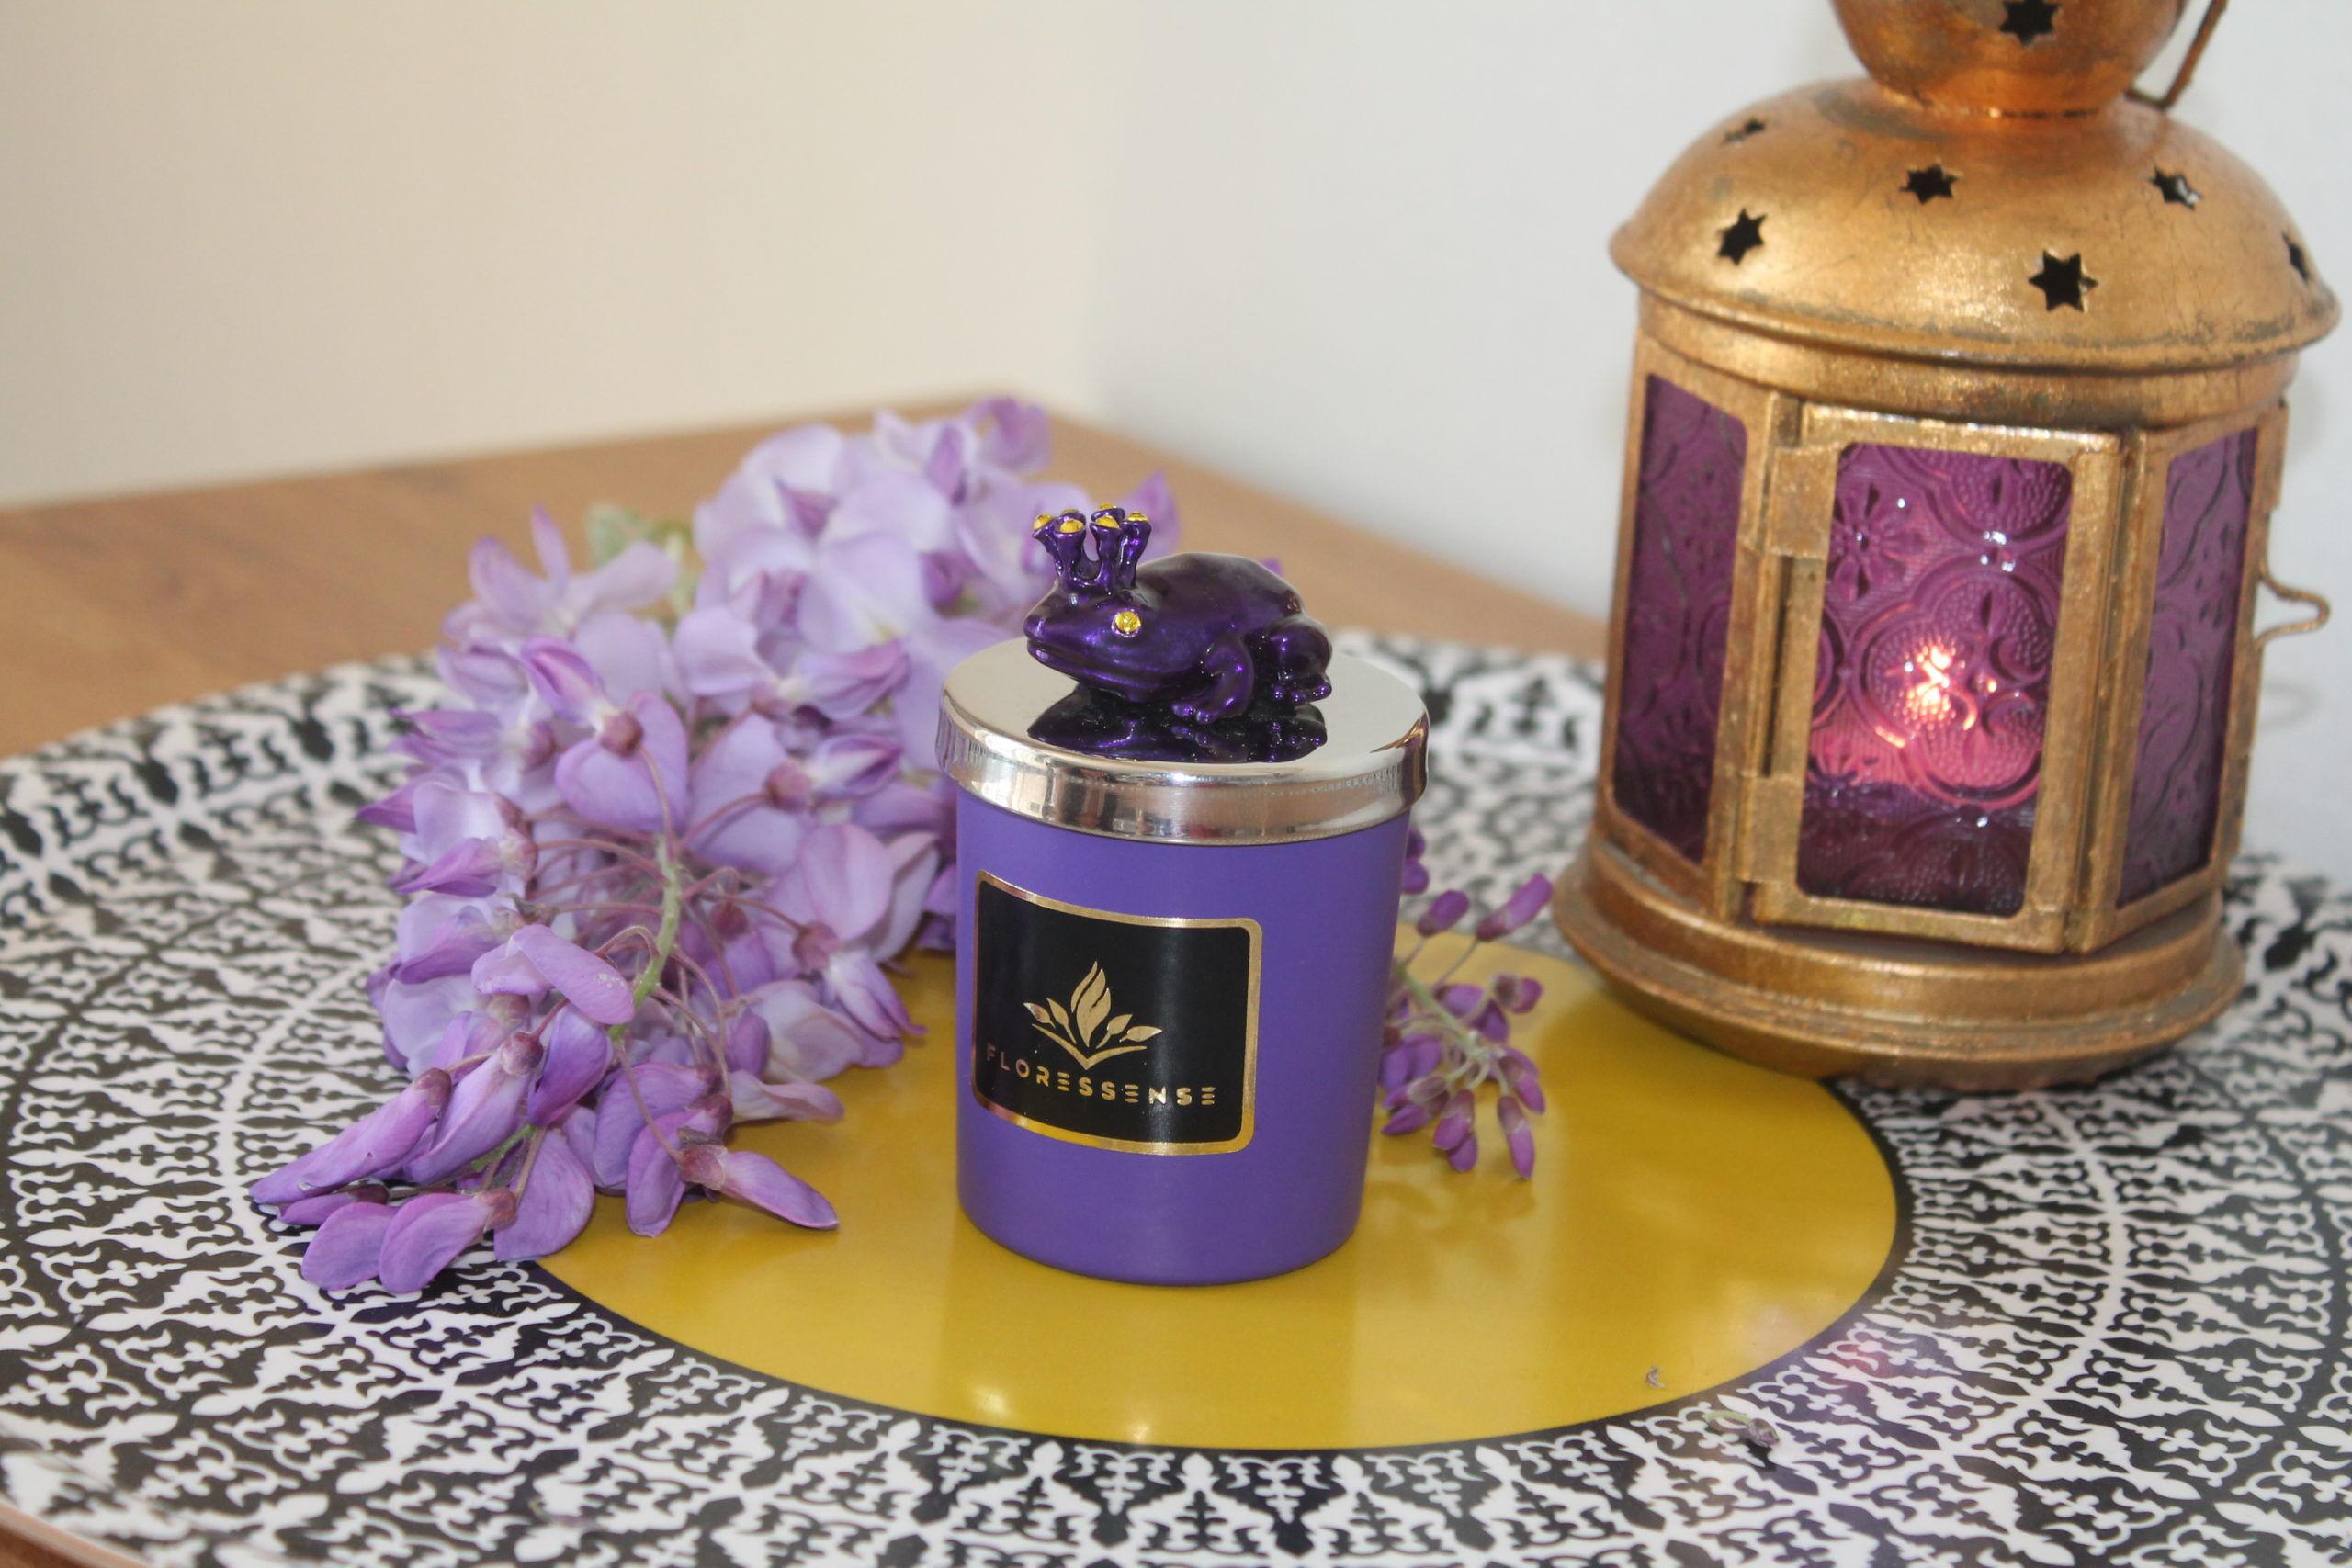 Floressense - bougie odorante luxe - Grenouille violet